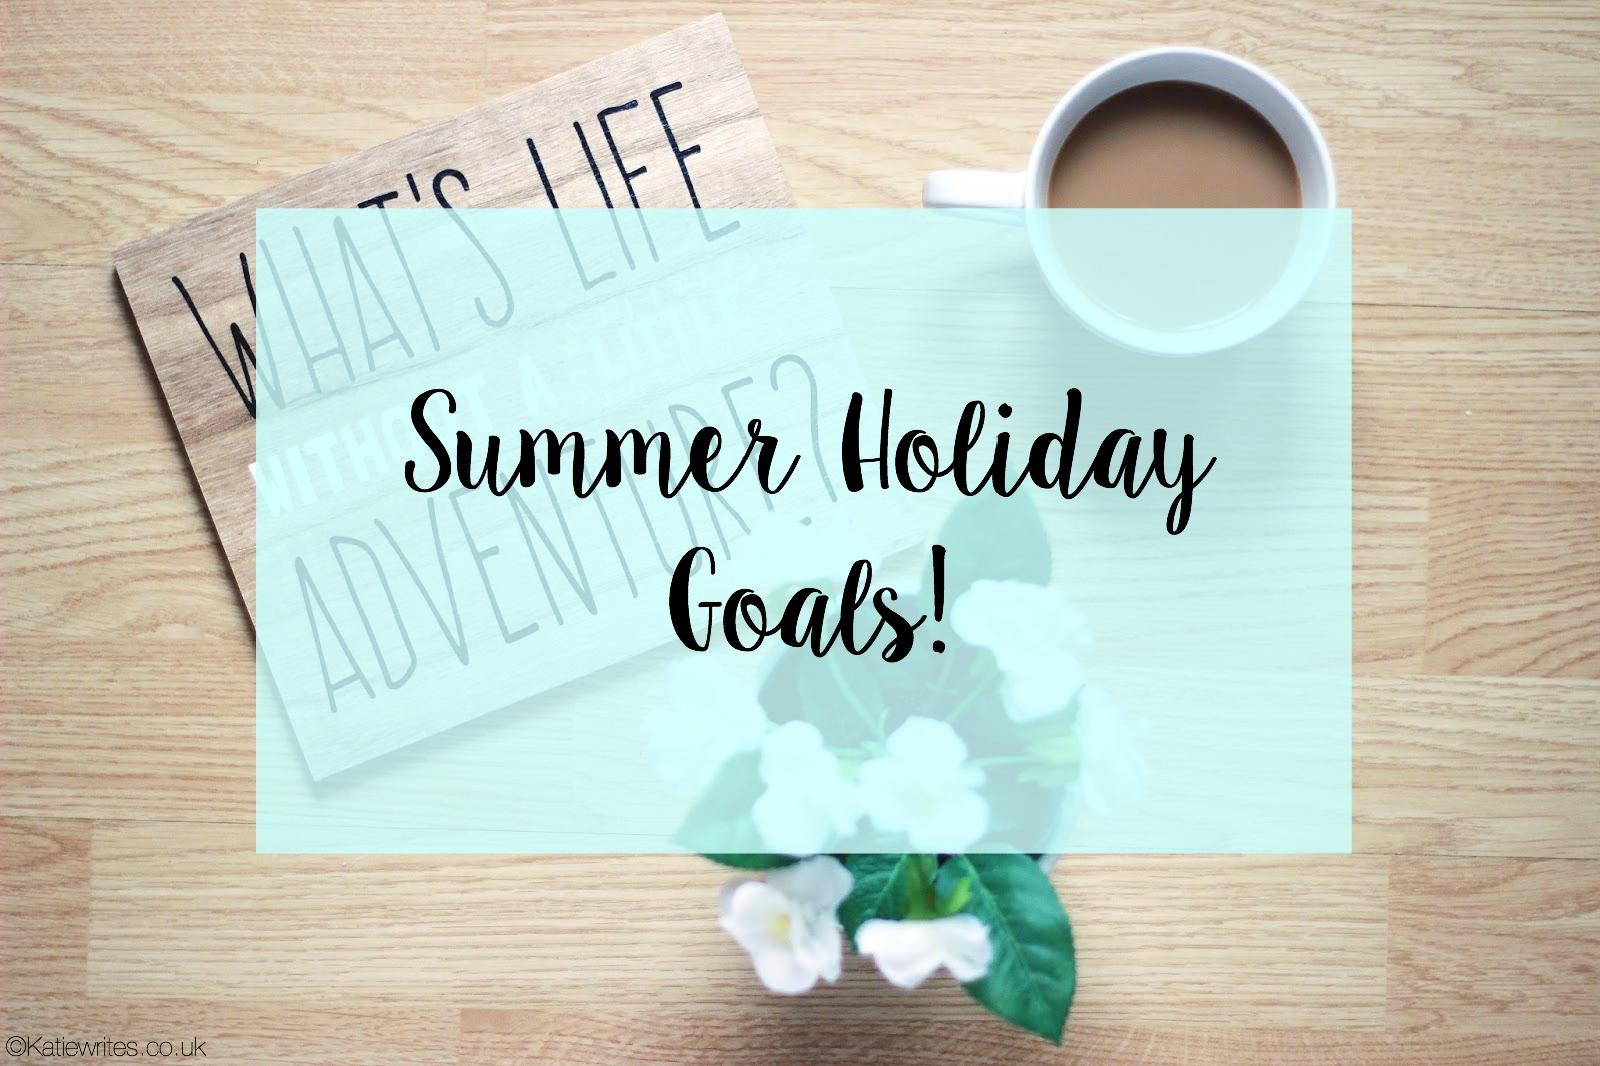 Summer Holiday Goals